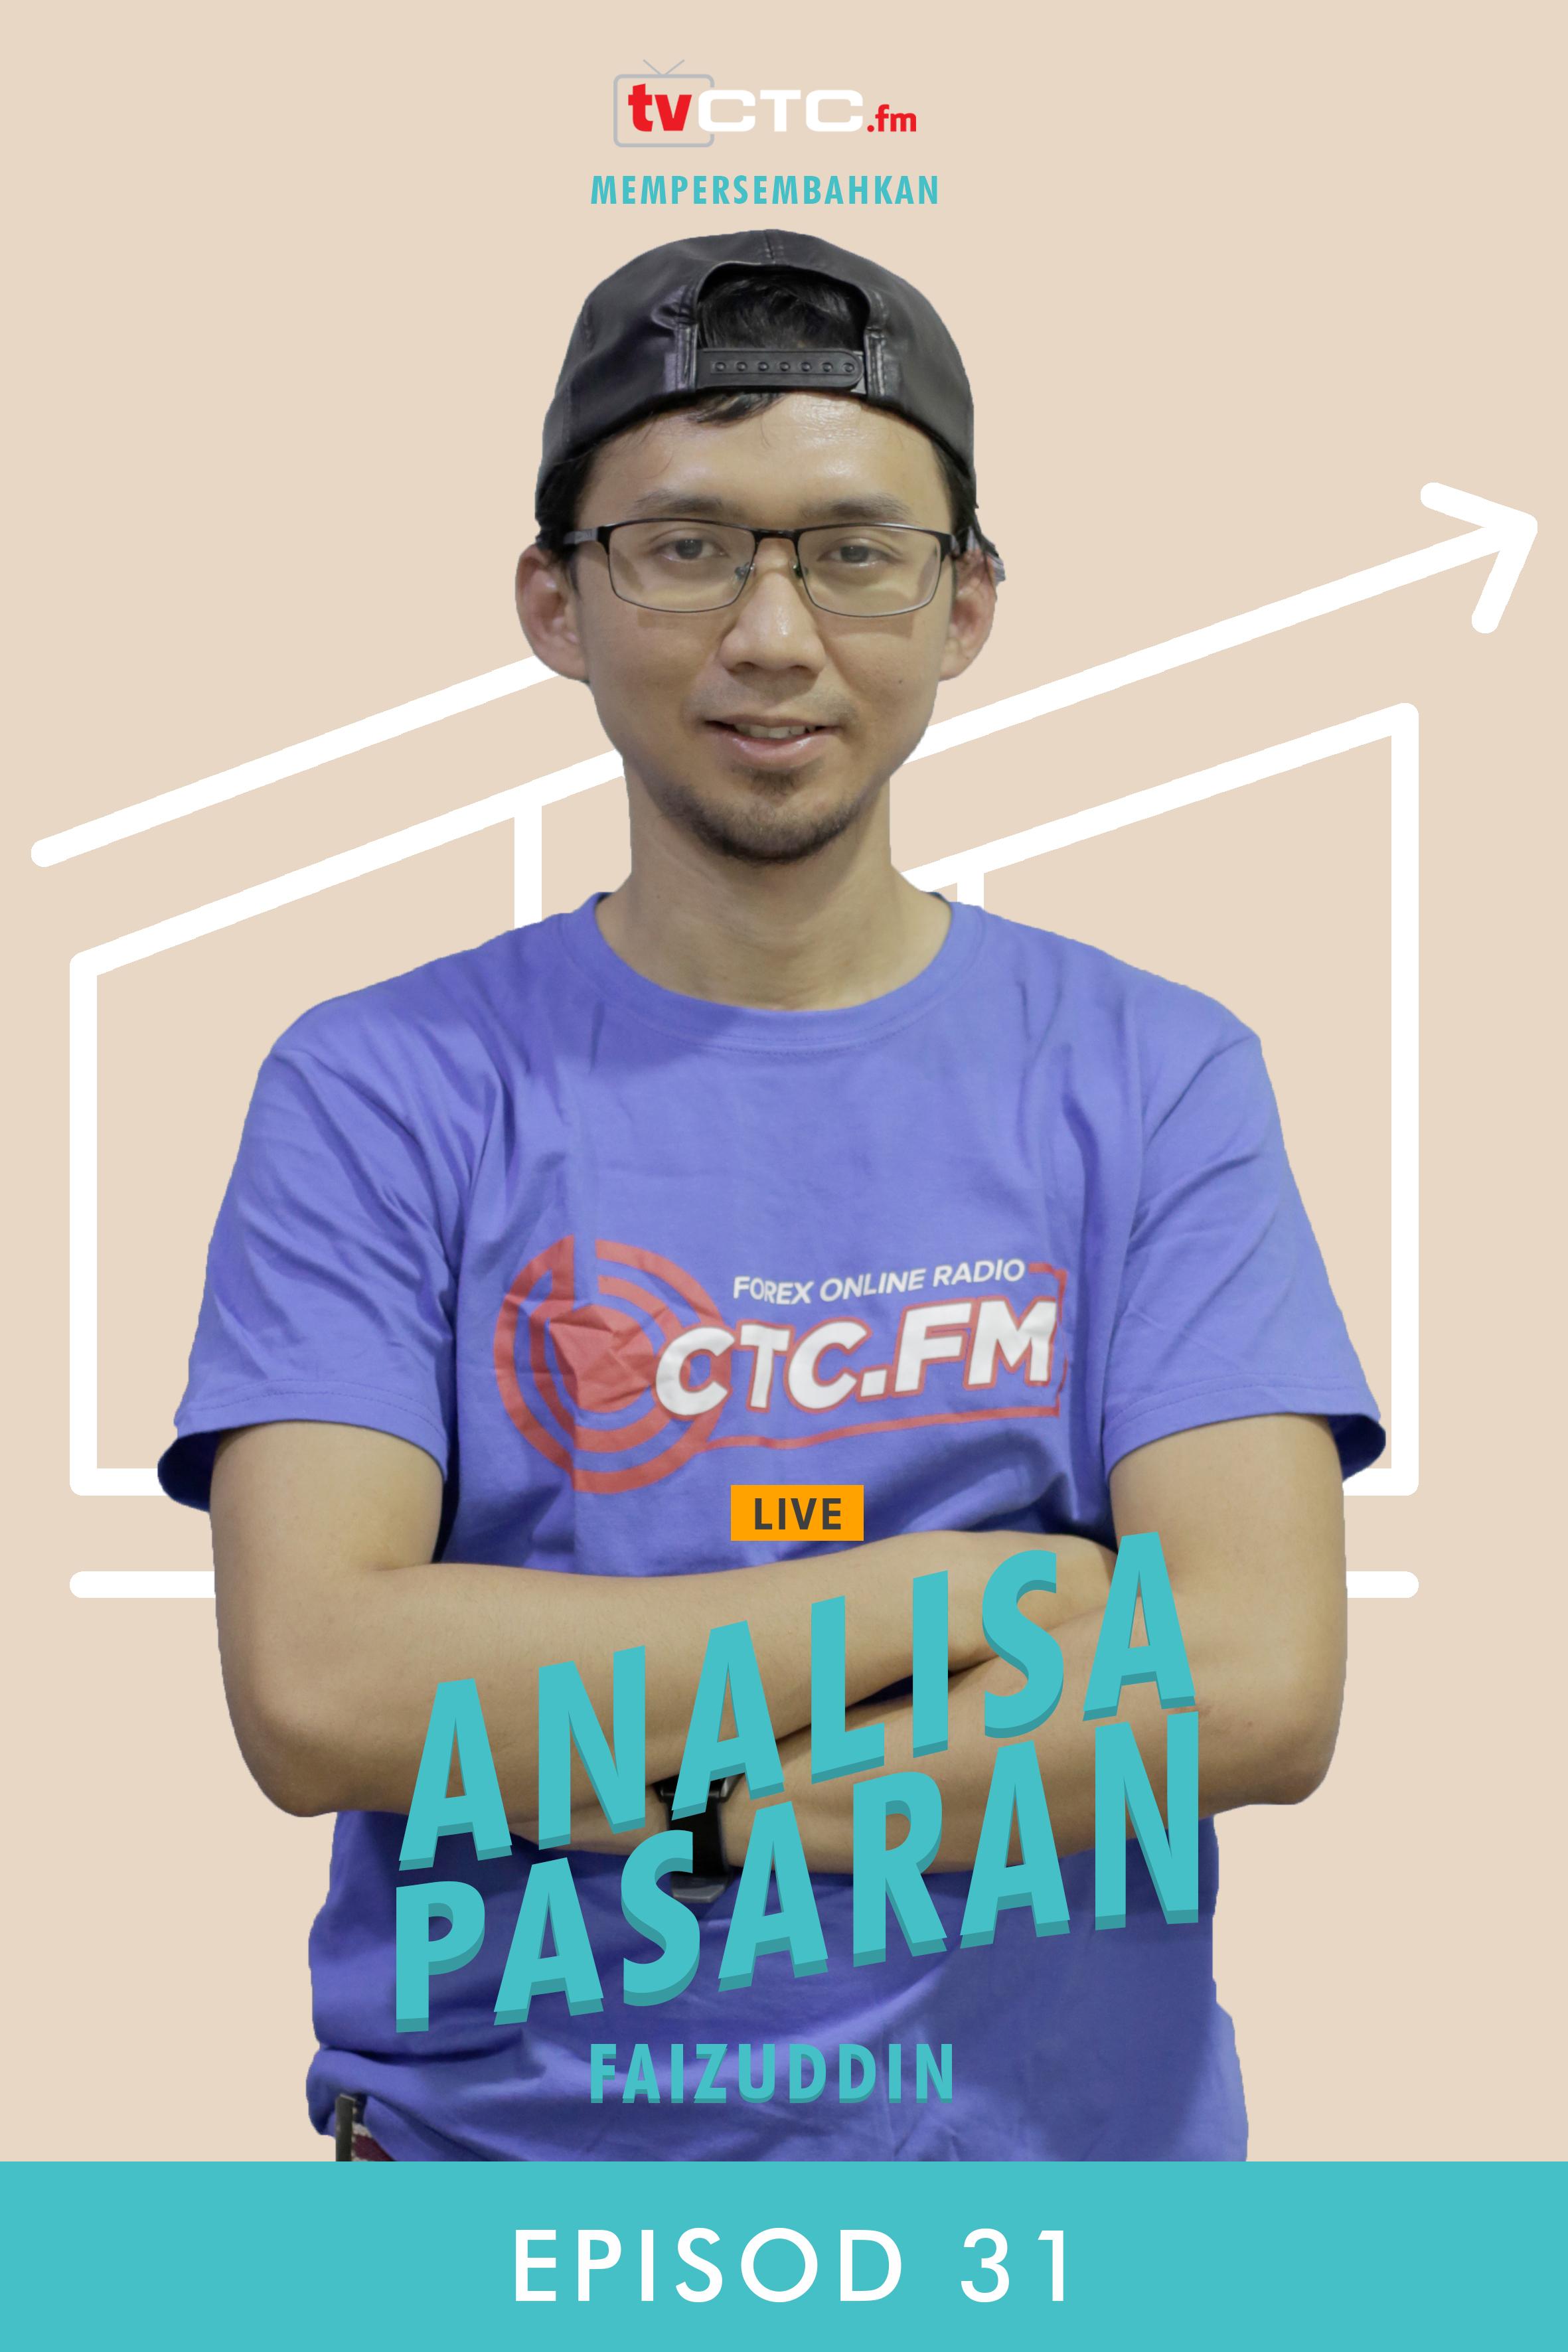 ANALISA PASARAN : Faizuddin (Episod 31)